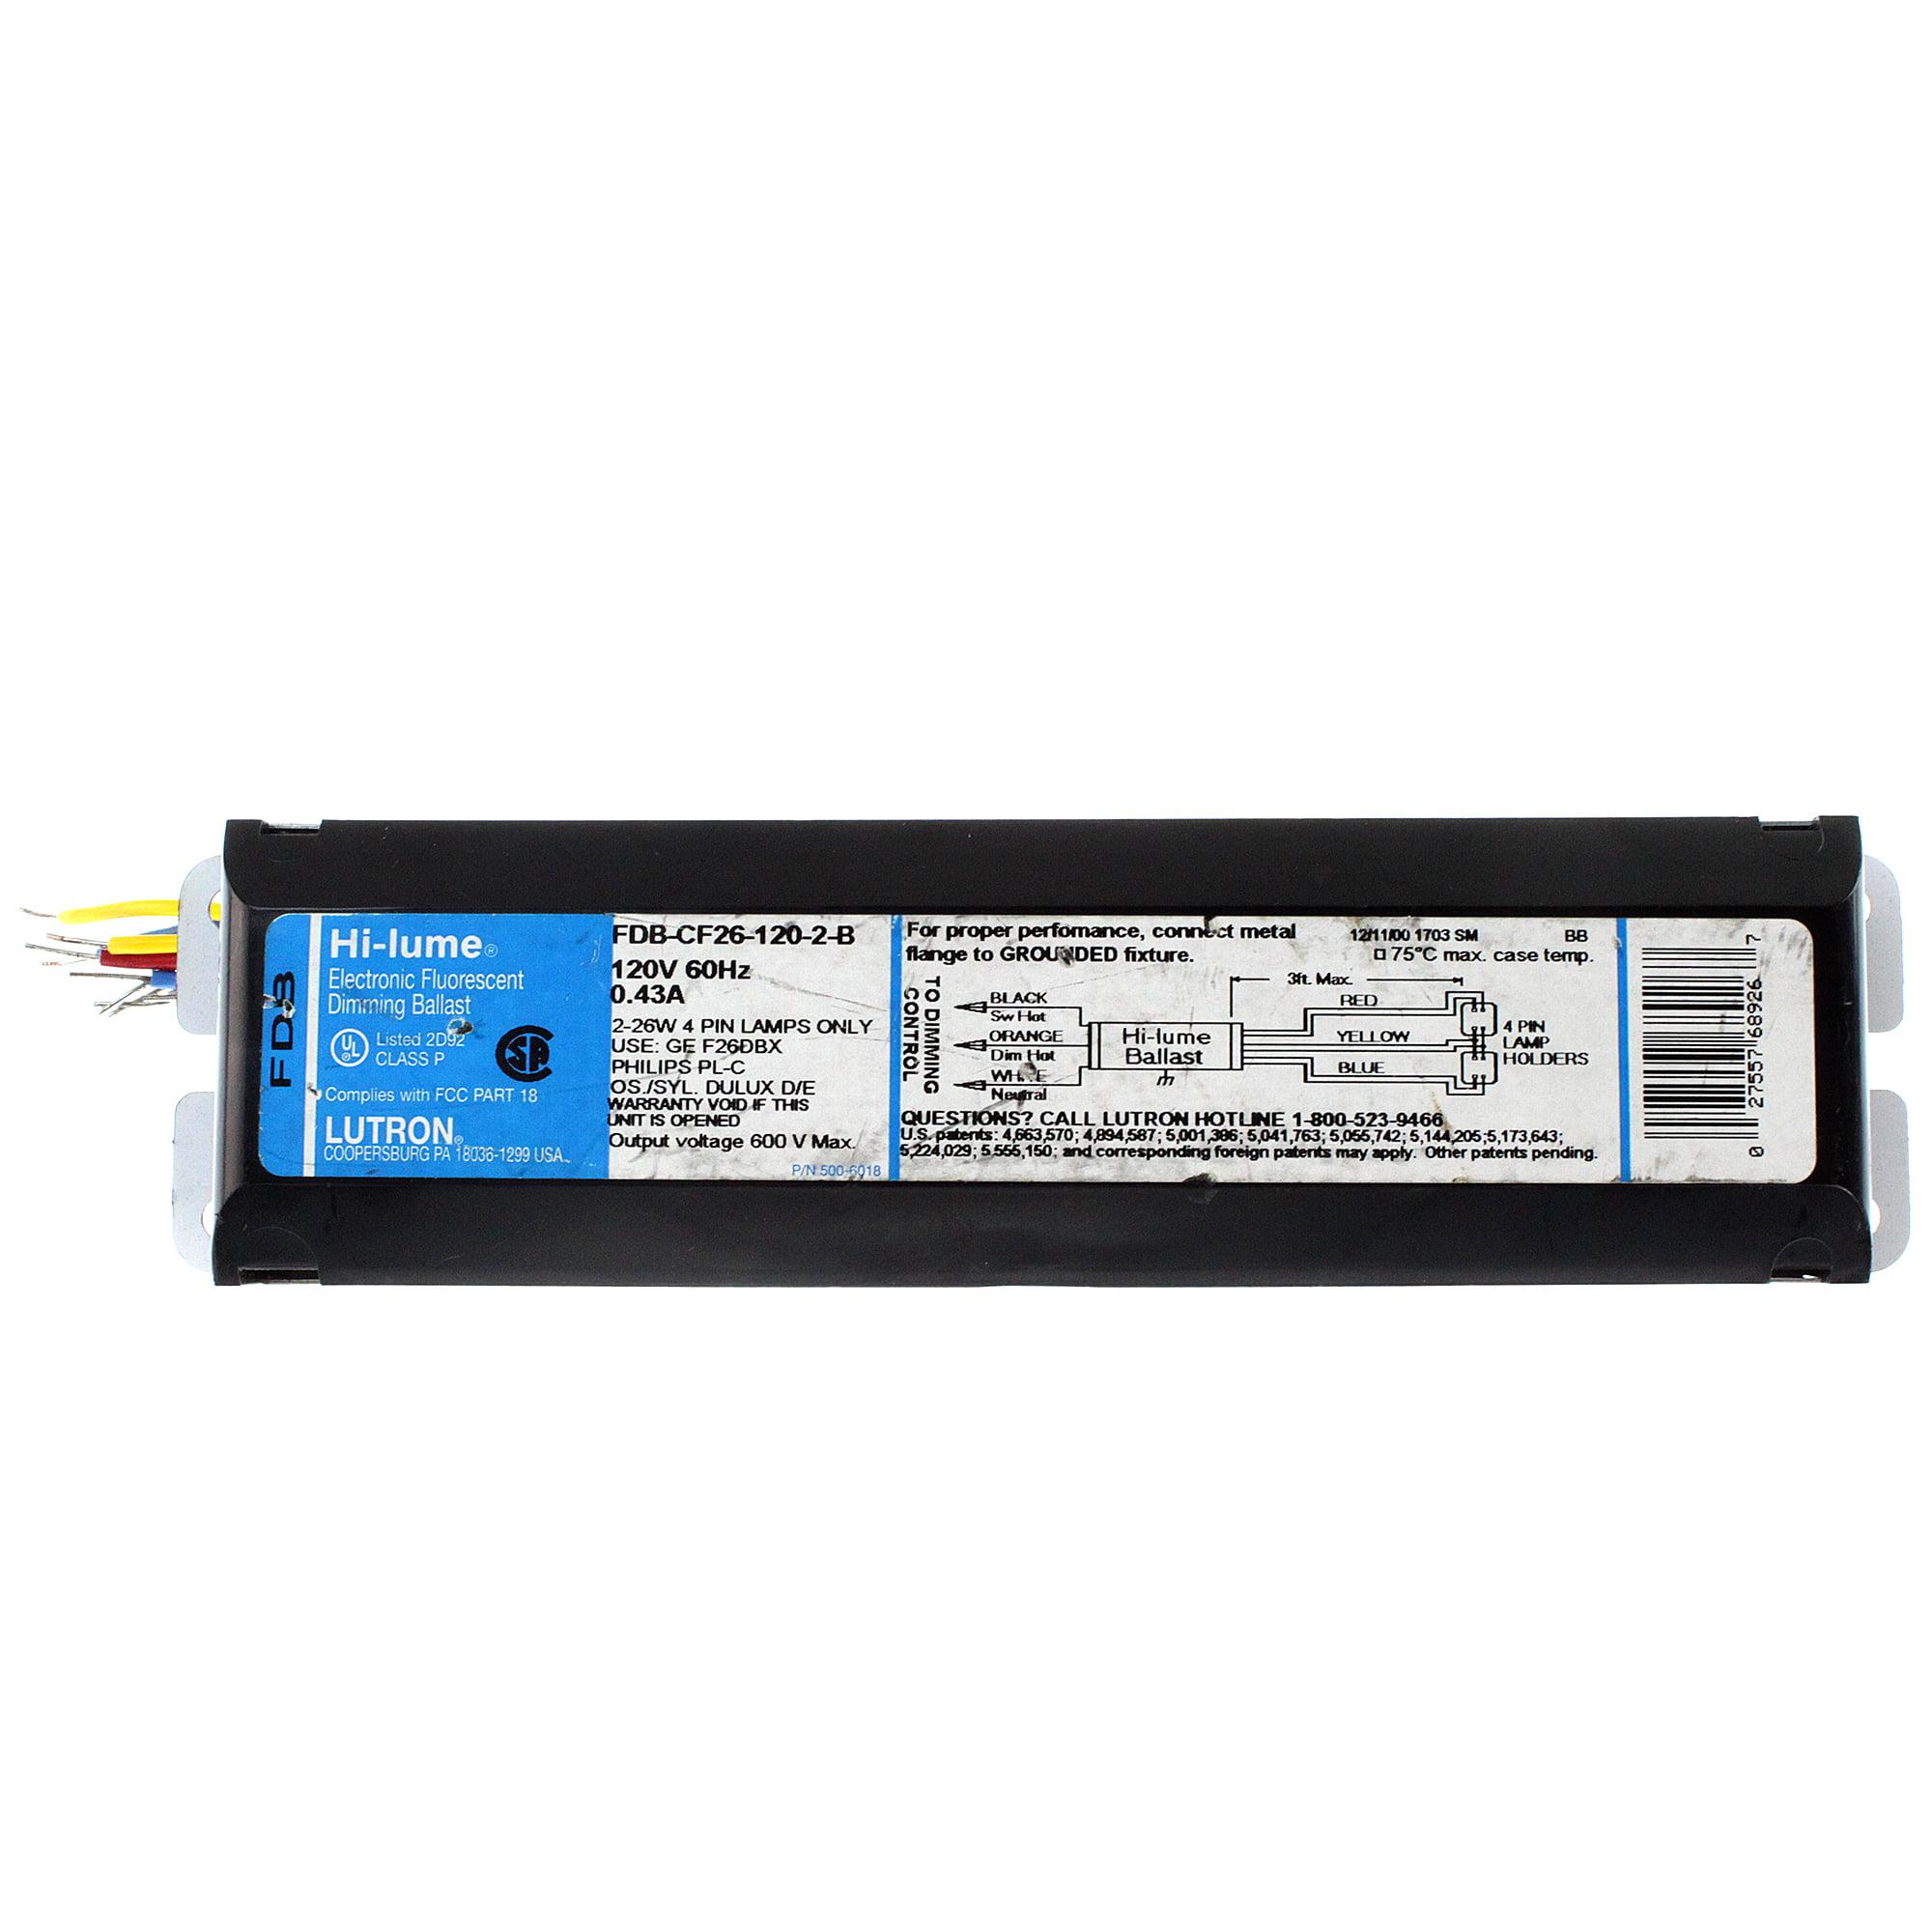 Lutron Ballast Dimming Wiring Diagram Ehdt832mu210 Hi Lume Flourescent 2000x2000